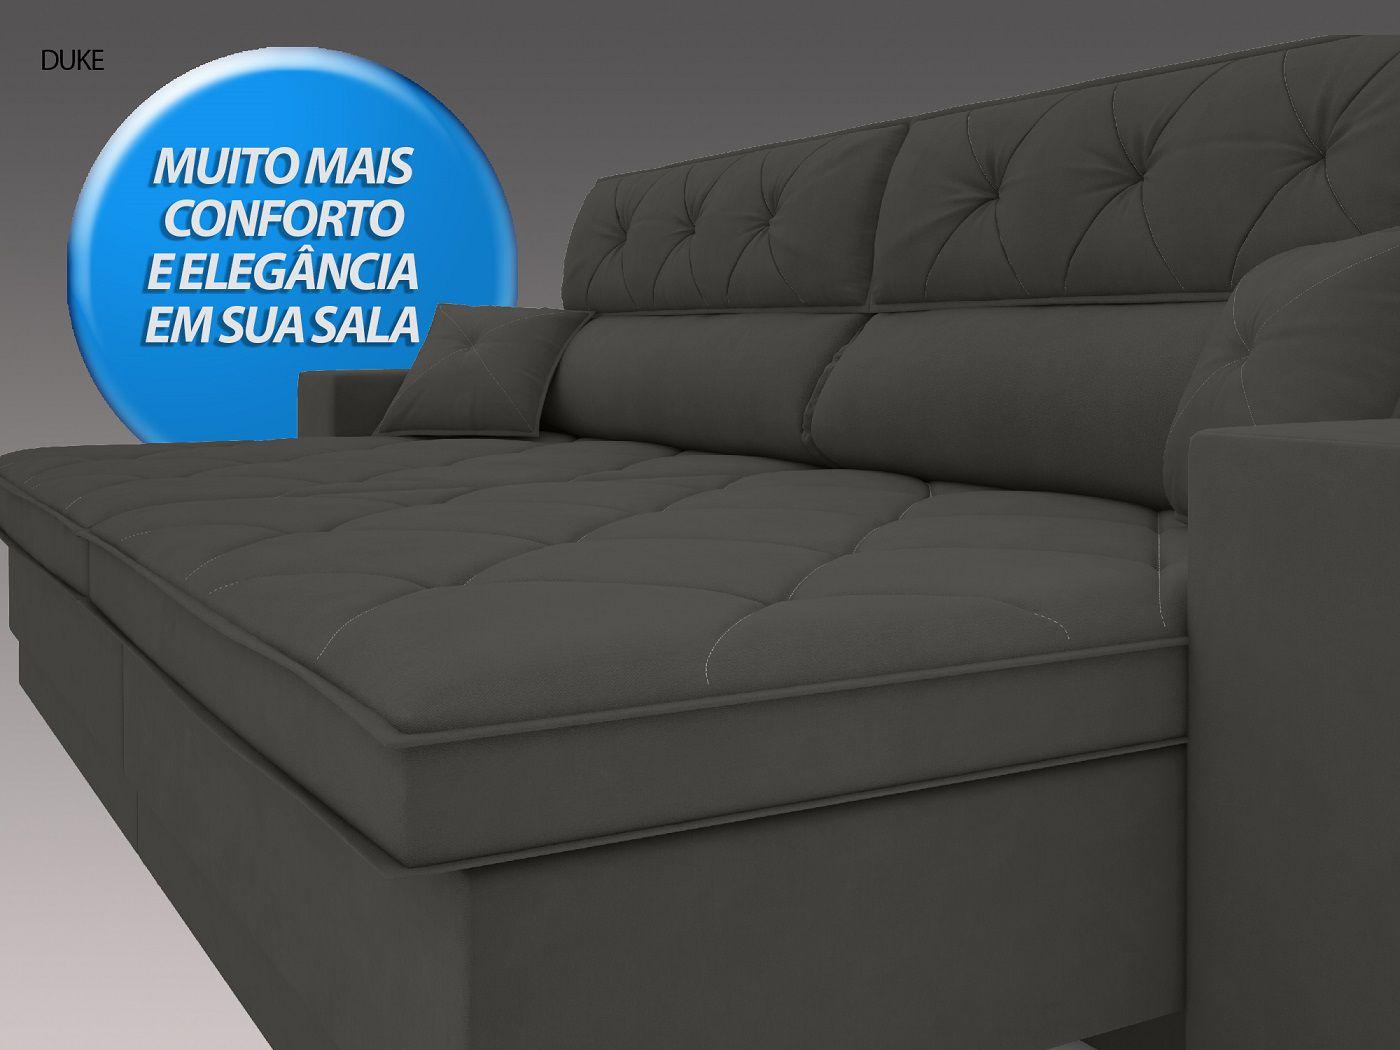 Sofá Duke 2,90m Retrátil e Reclinável Velosuede Cinza - NETSOFAS